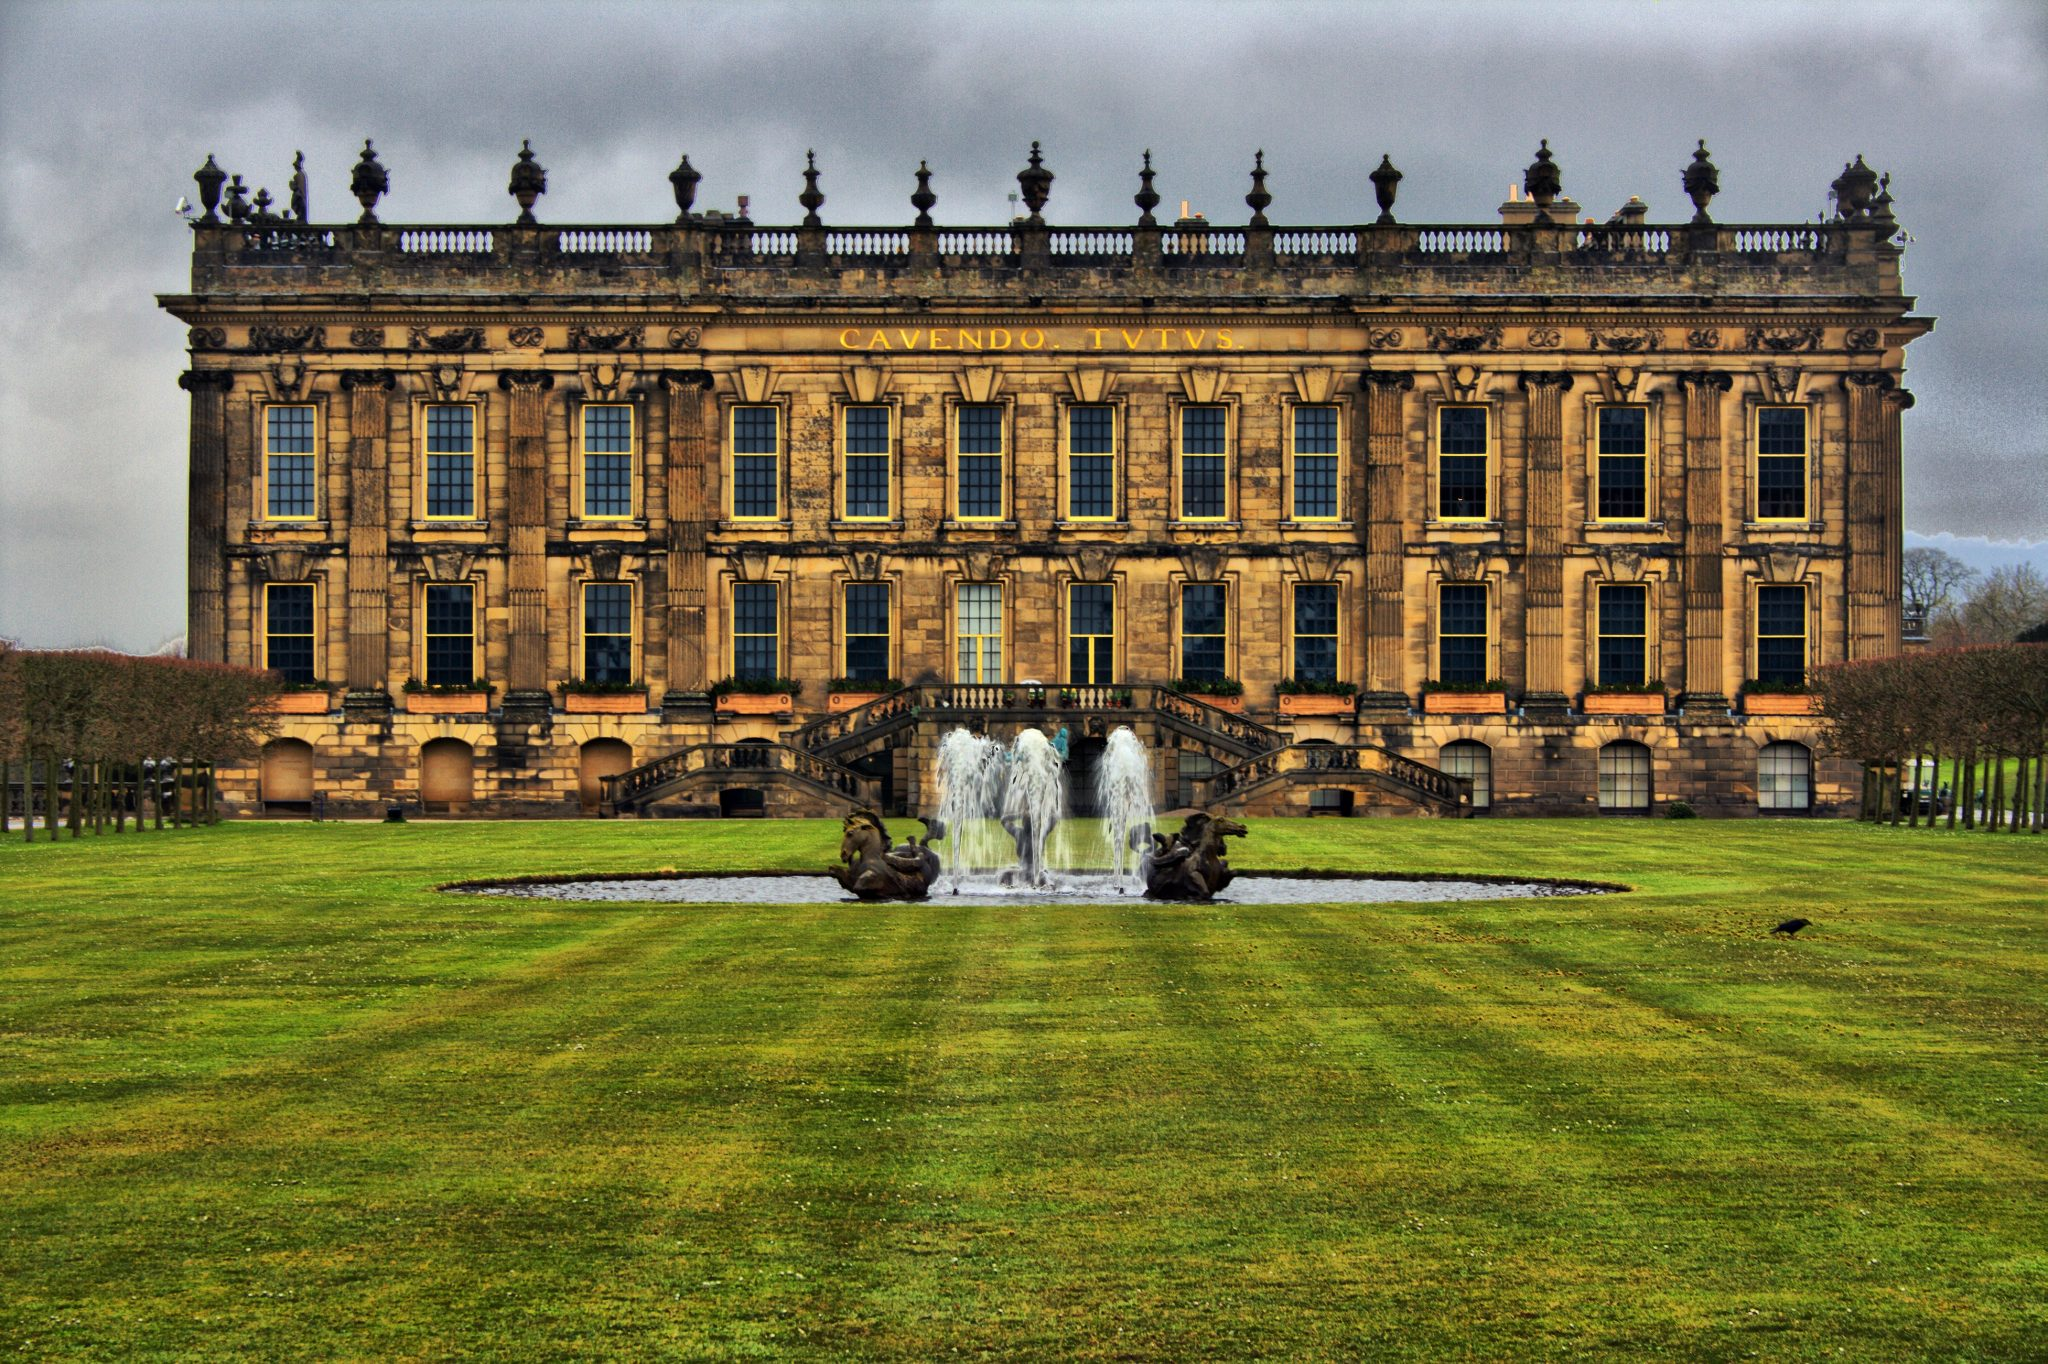 chatsworth-house-fountain-grass-lawn